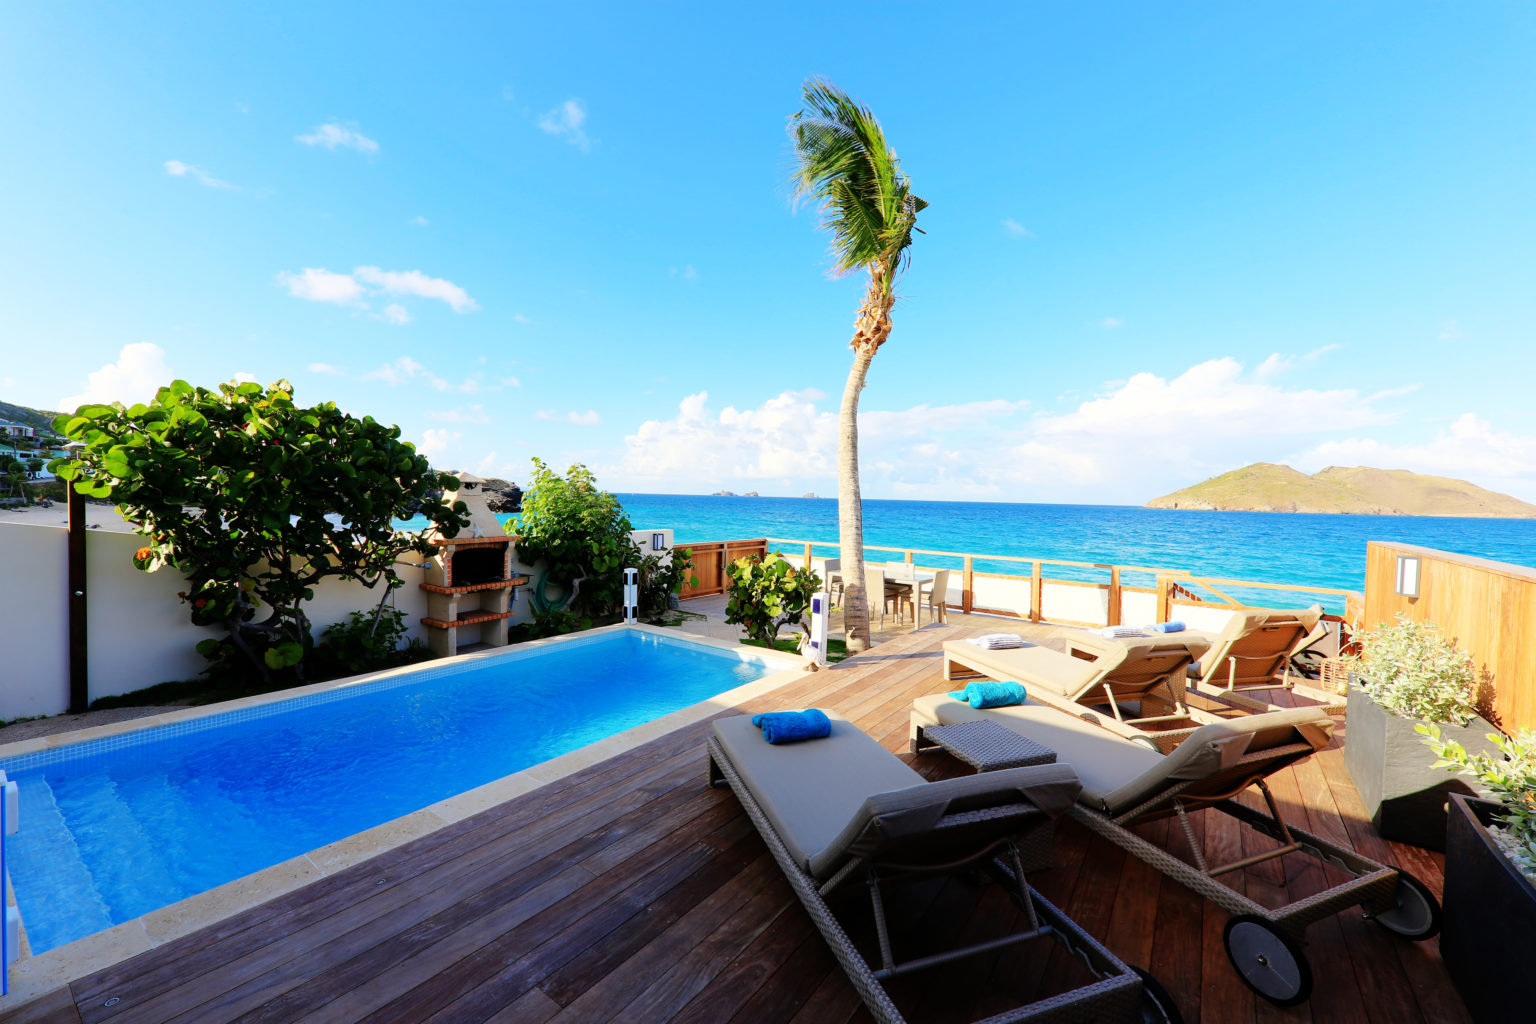 Villa Les Raisiniers - Beachfront Villa for Rent St Barth with Pool - Ocean View